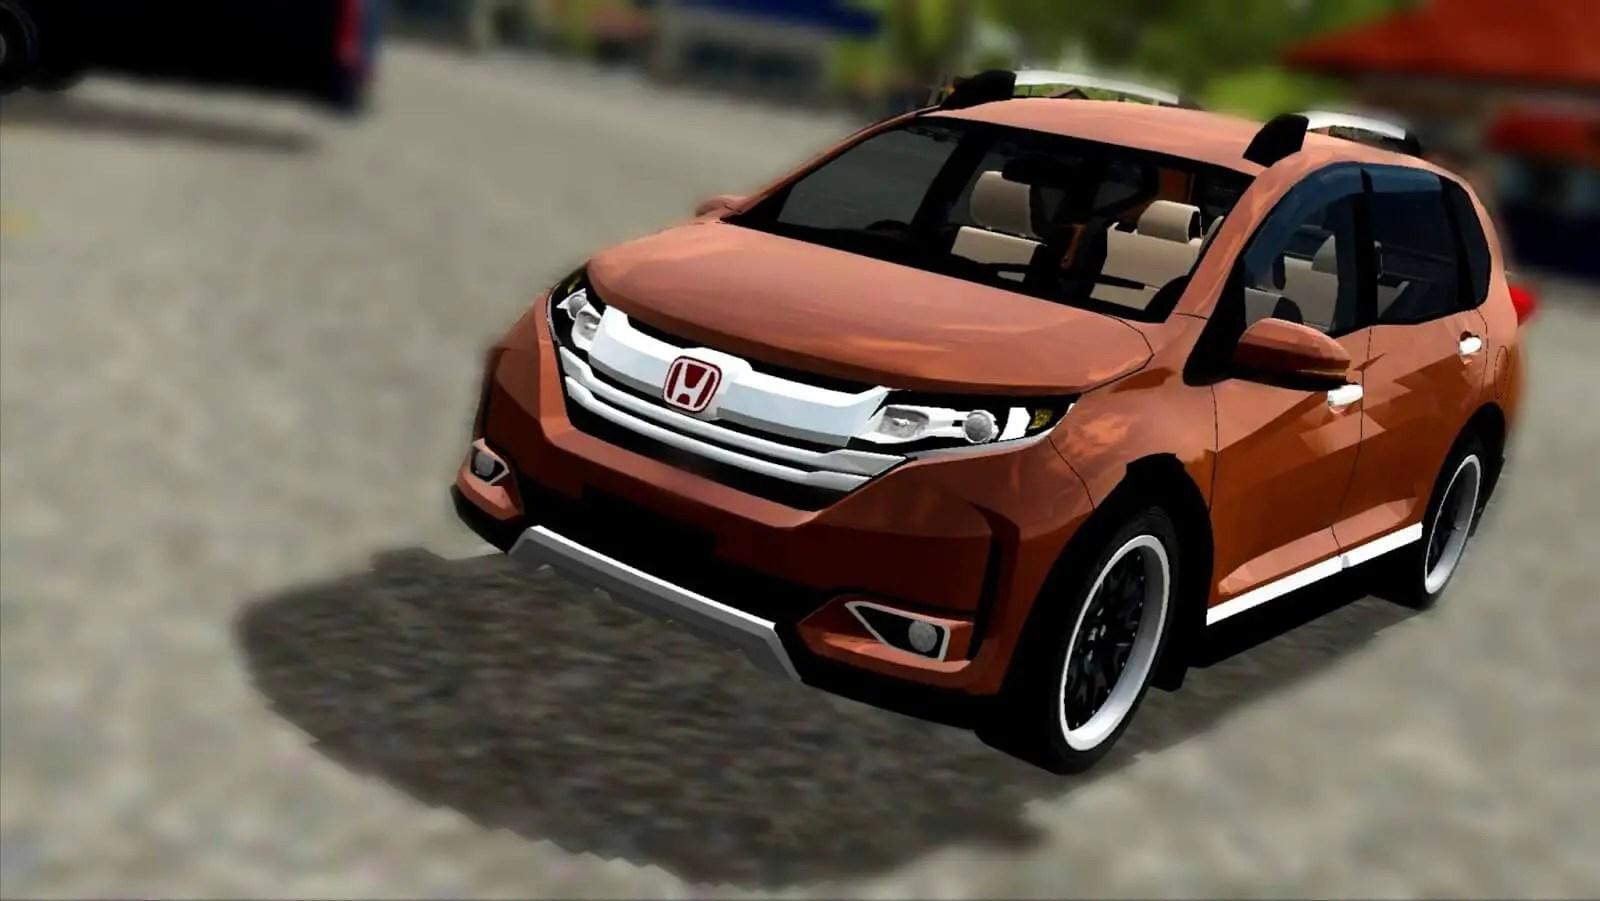 Download Honda BRV Prestige Car Mod for Bus Simulator Indonesia, Honda BRV Prestige, BUSSID Car Mod, BUSSID Vehicle Mod, Honda BRV Prestige, NanoNano